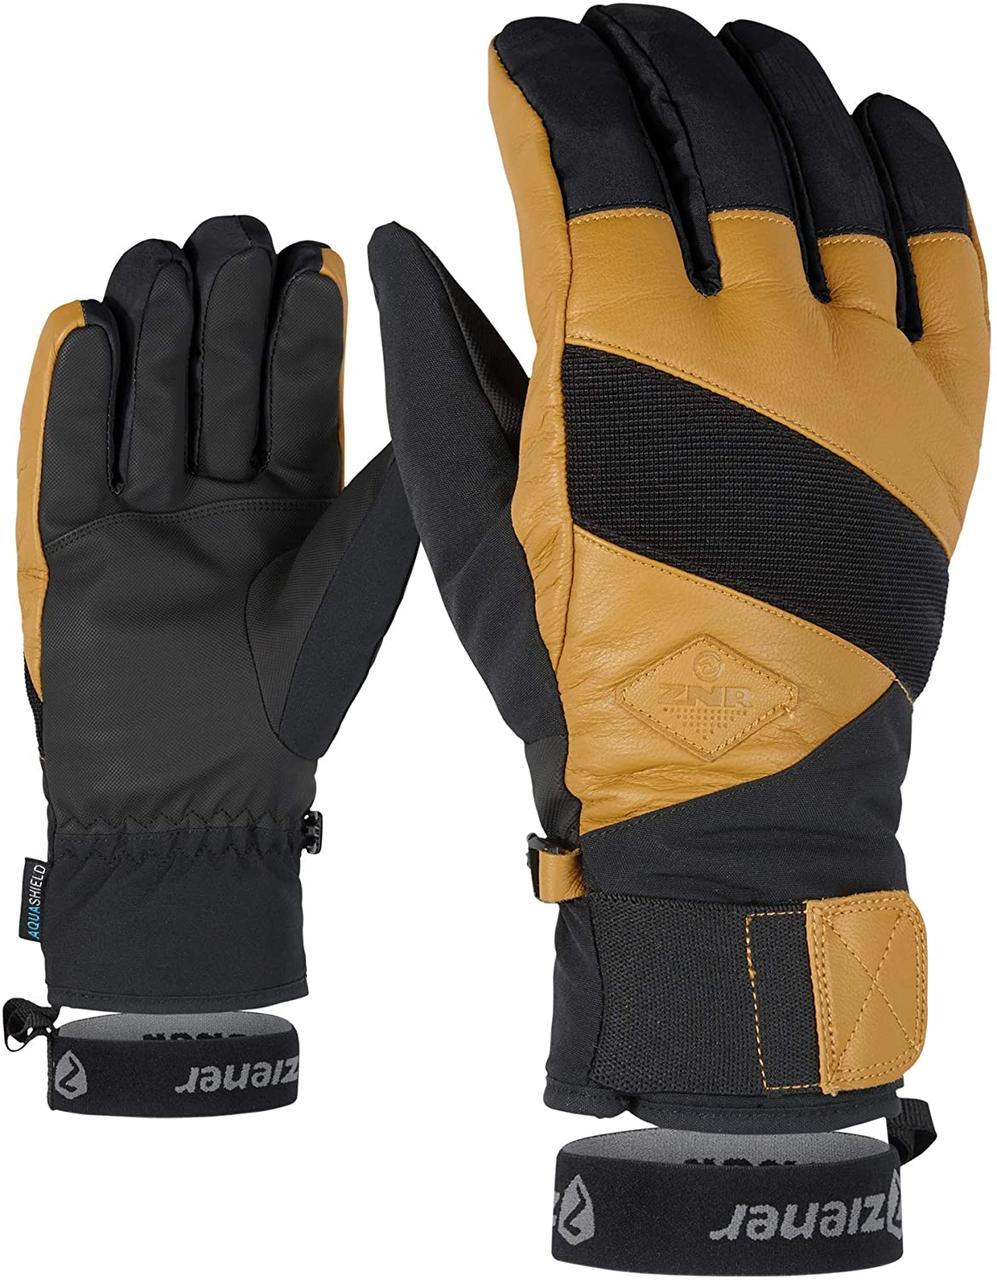 Гірськолижні рукавички Ziener Erwachsene GIX AS AW   розмір - 8.5